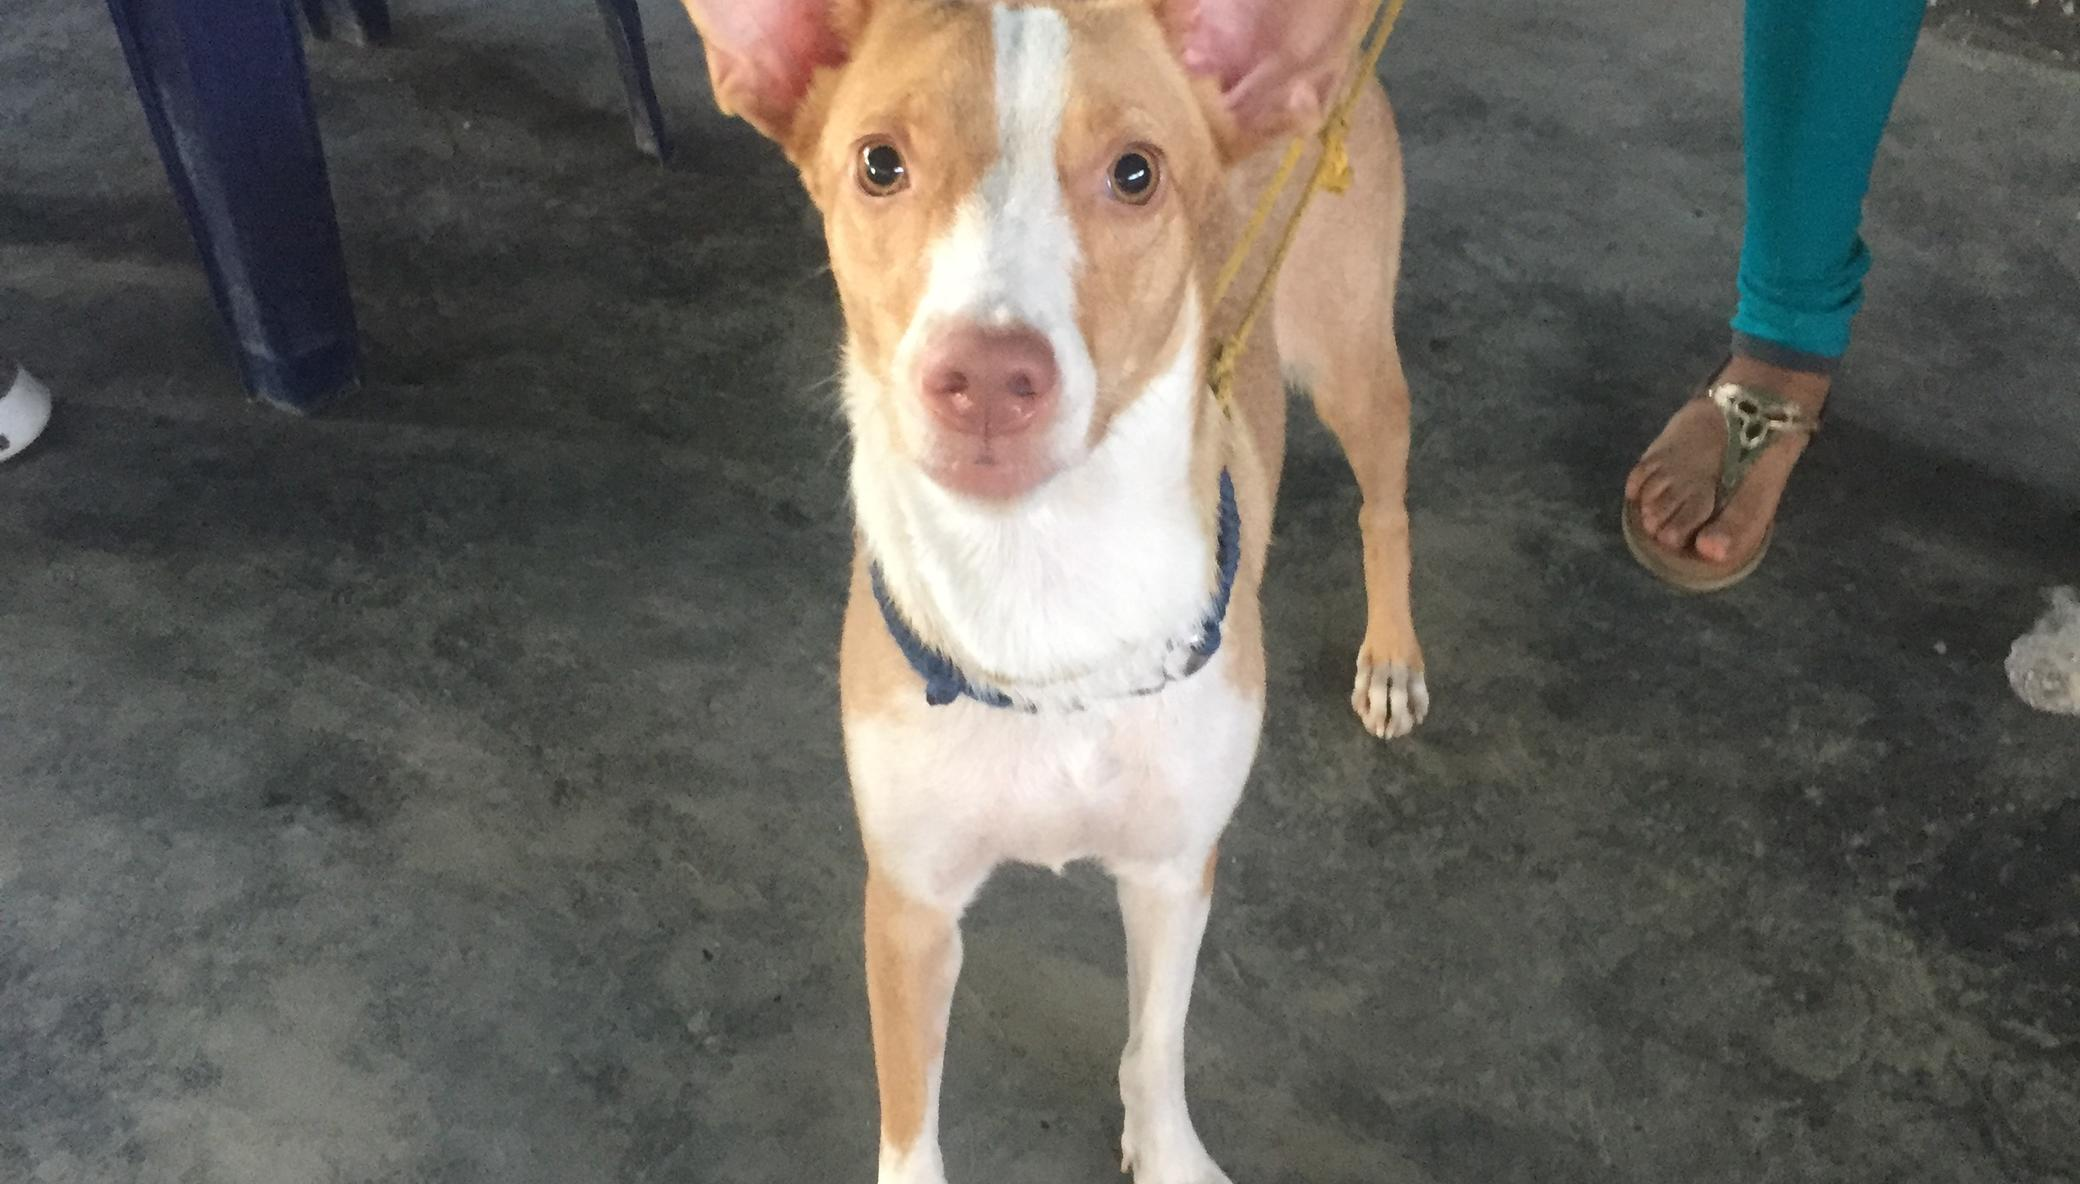 Let's vaccinate 1,000 Venezuelan dogs (rabbies)